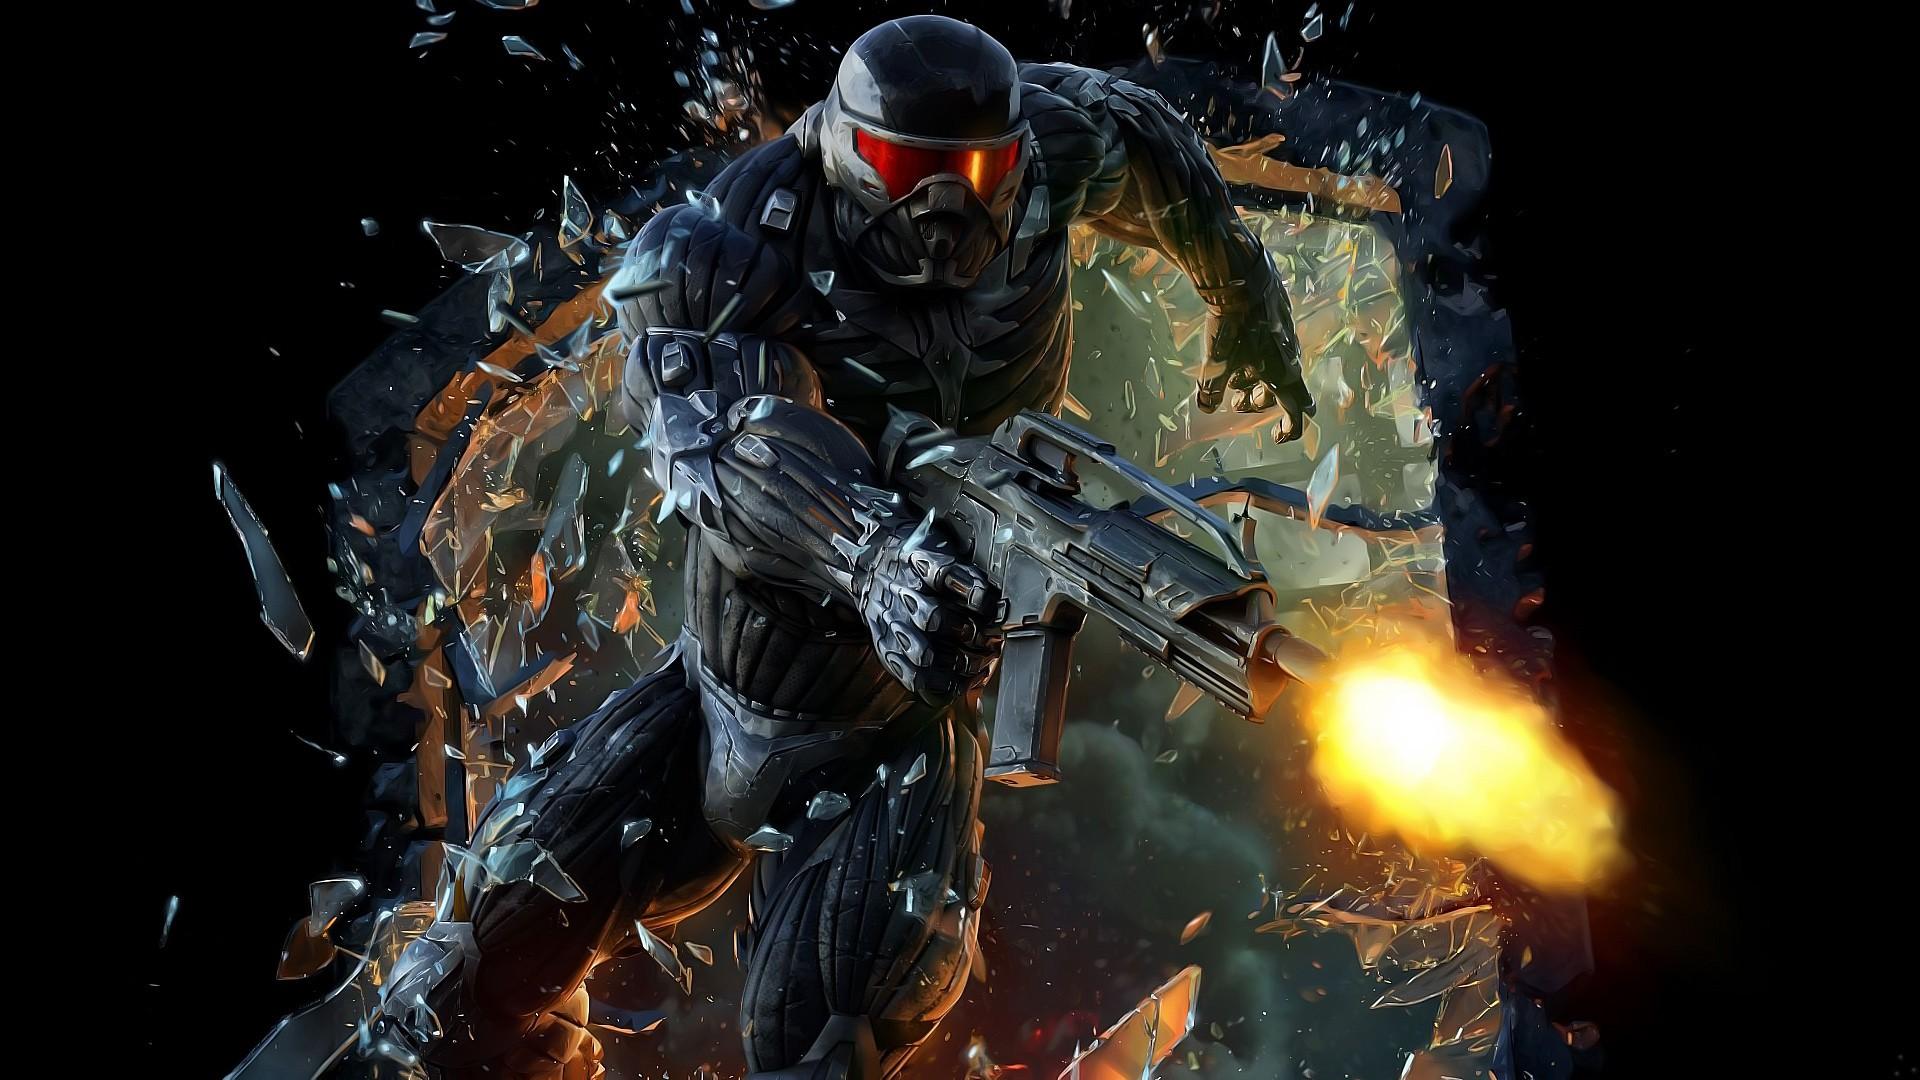 Halo 5 Wallpaper 1080p 74 images 1920x1080